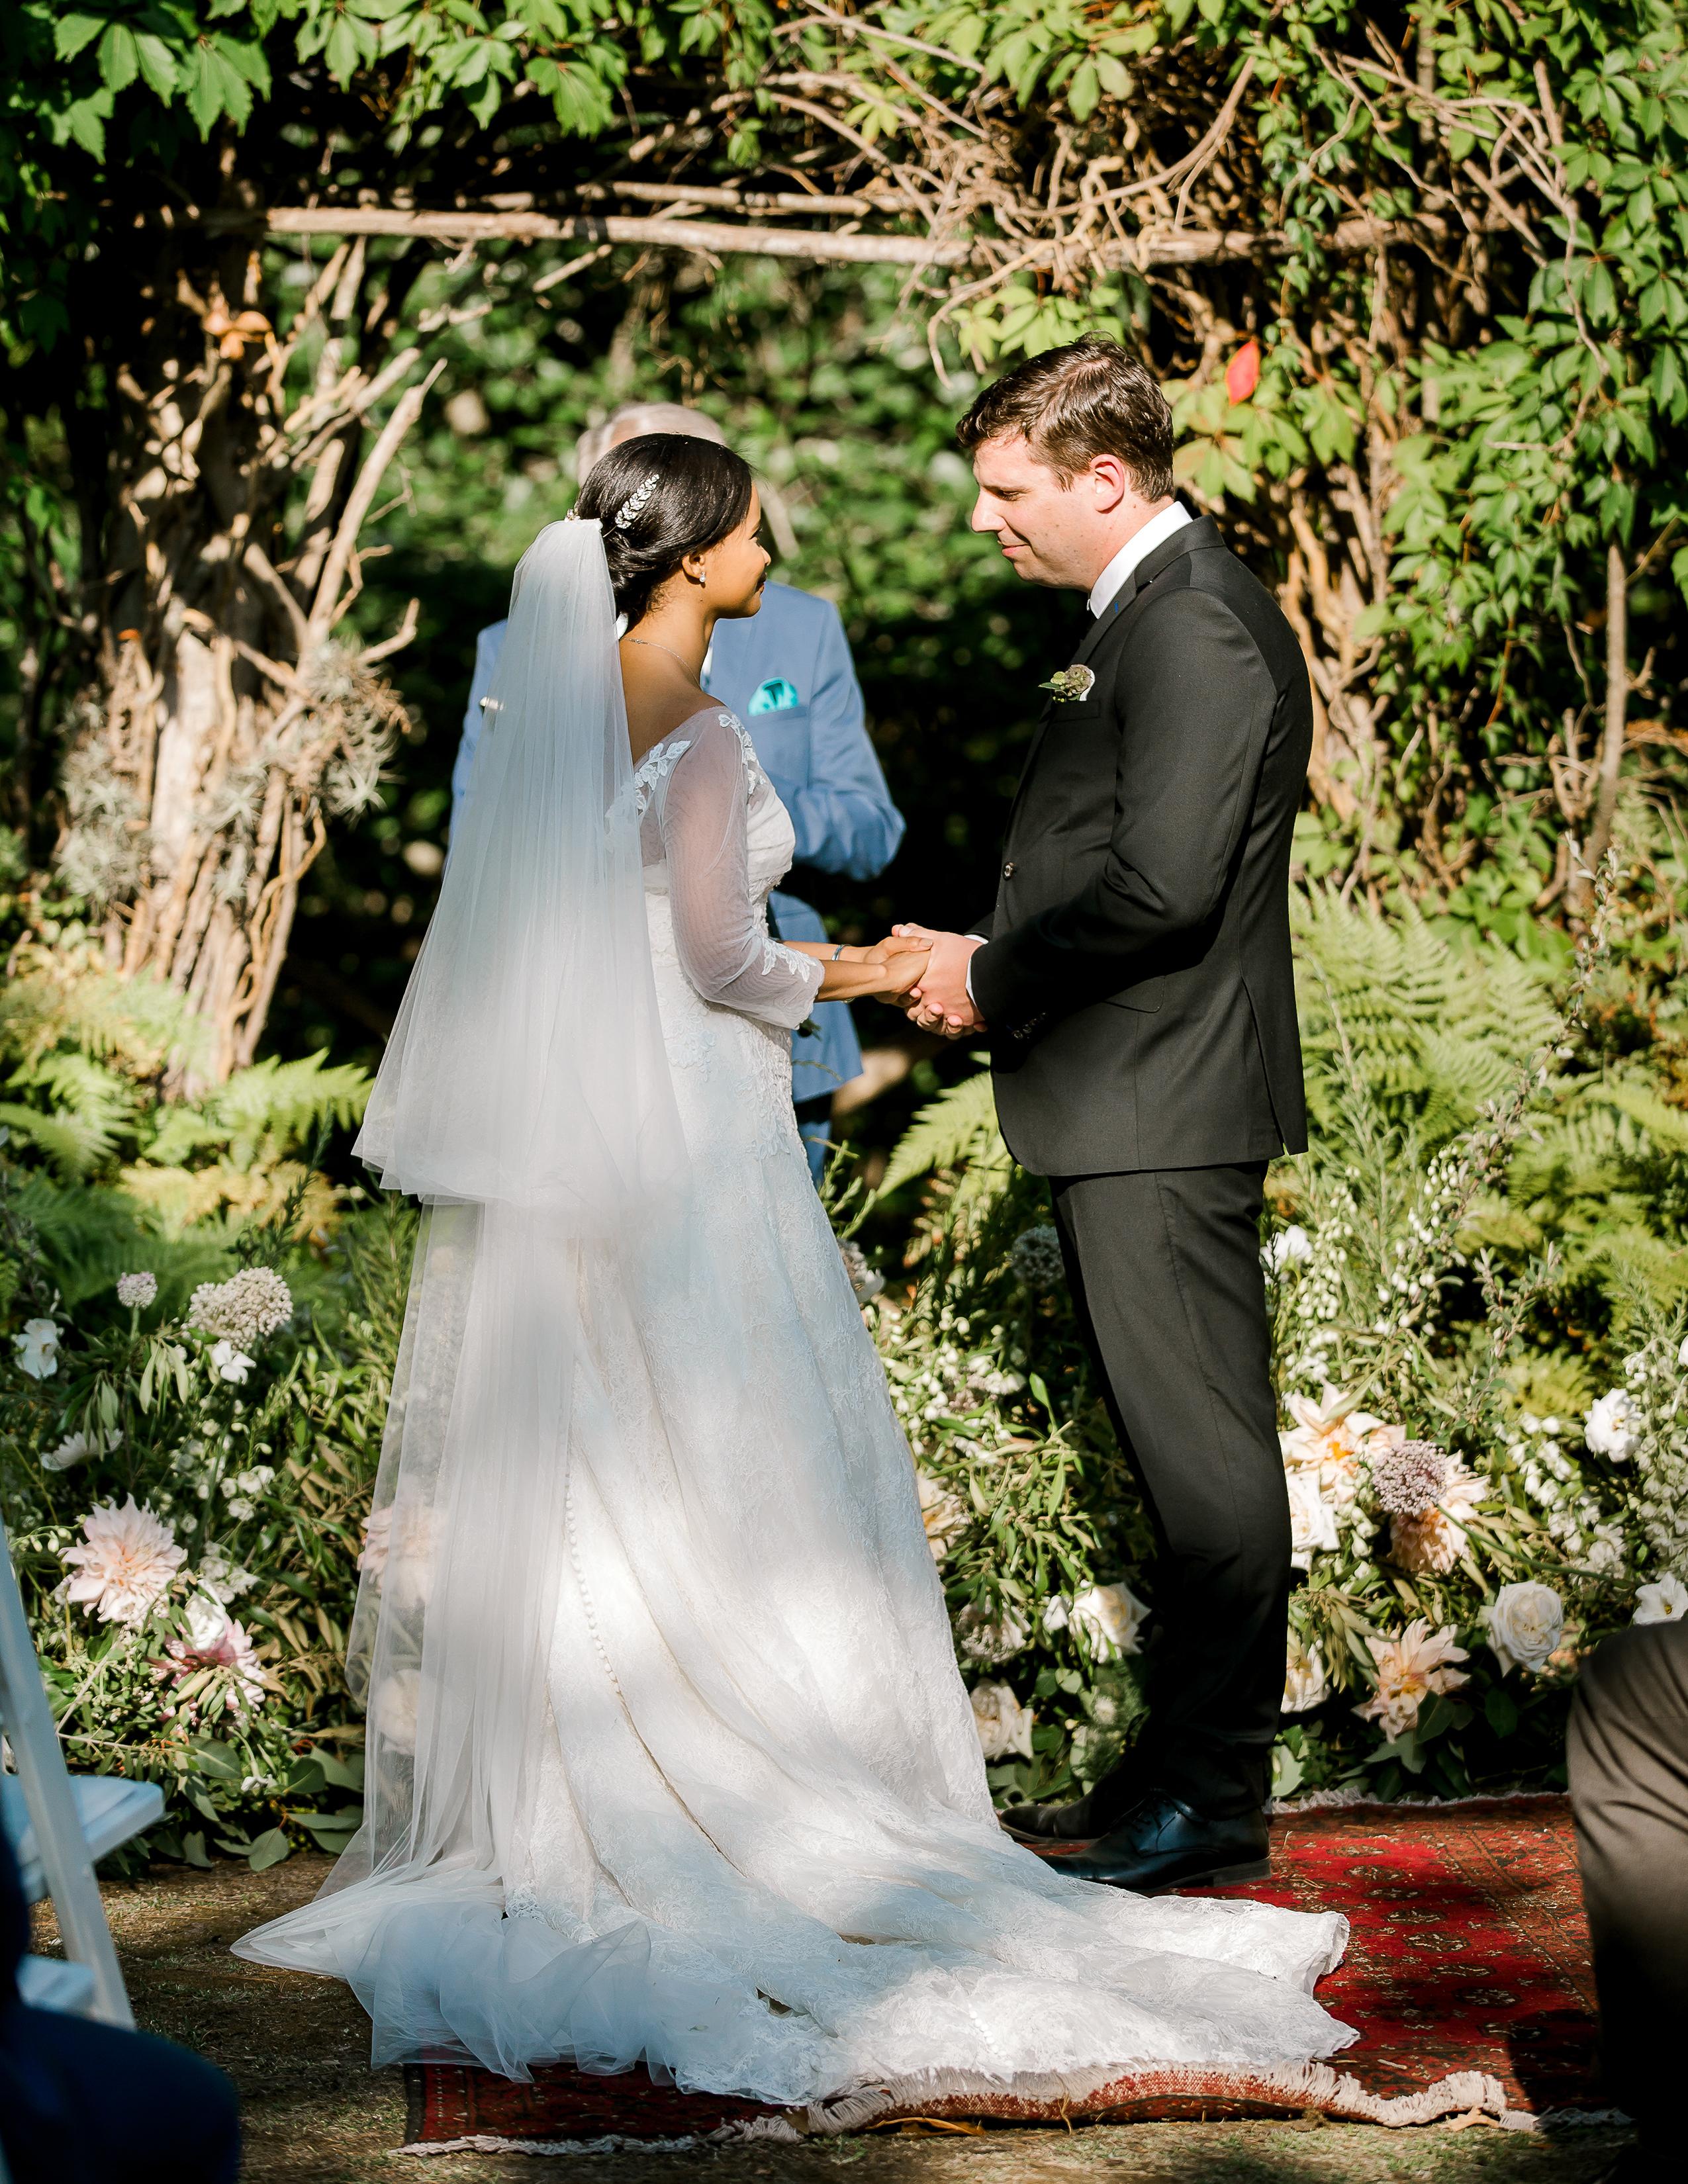 rorisang stephen wedding ceremony